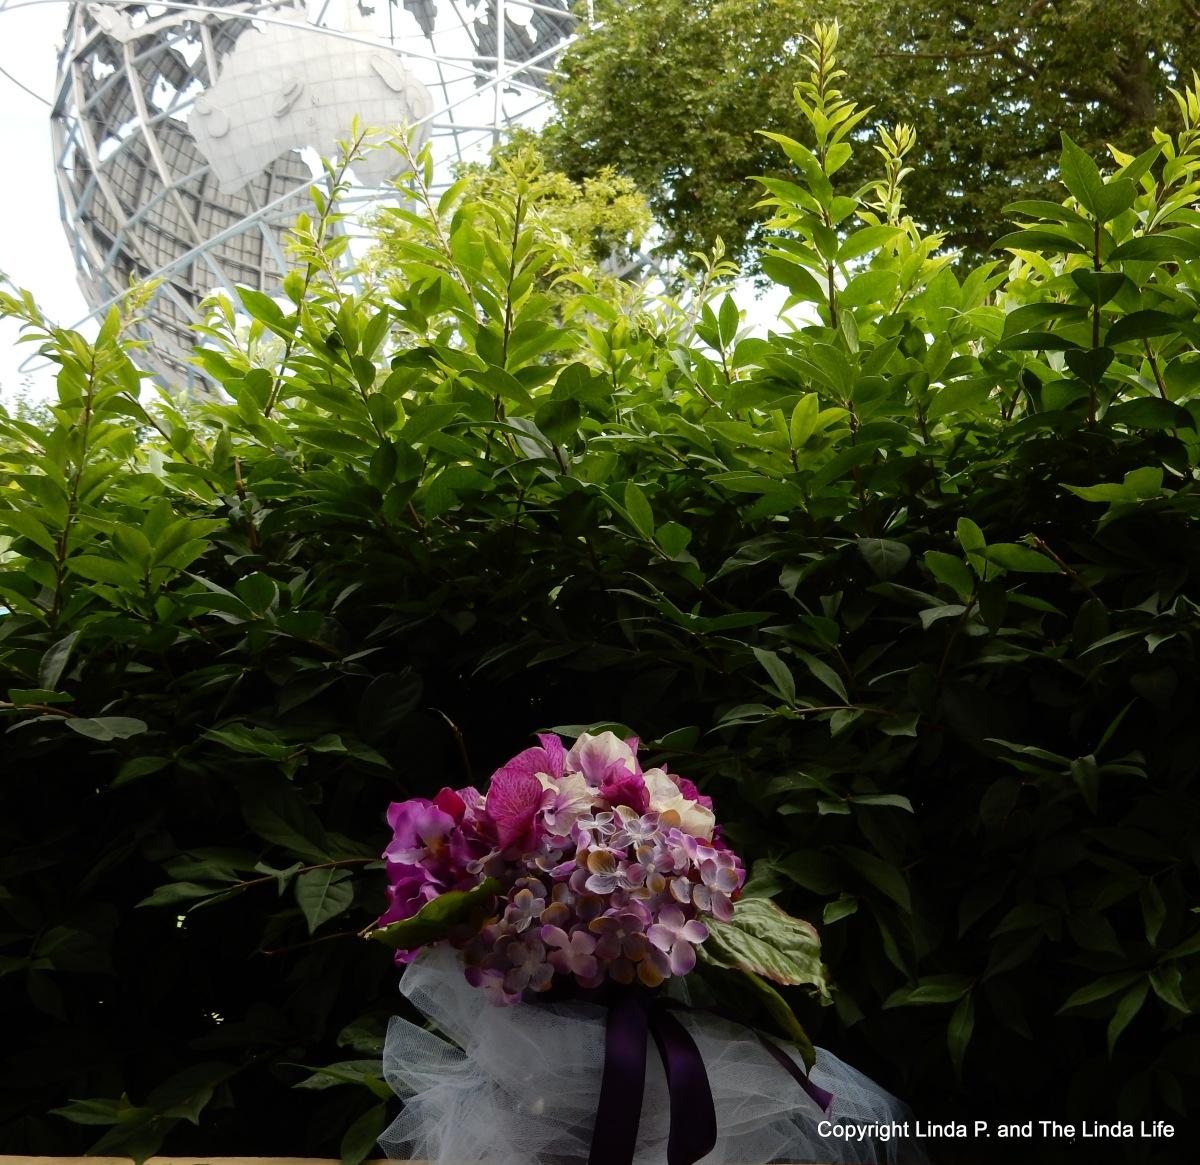 Bokeh Flowers Wedding: I Tried To Bokeh A Bouquet